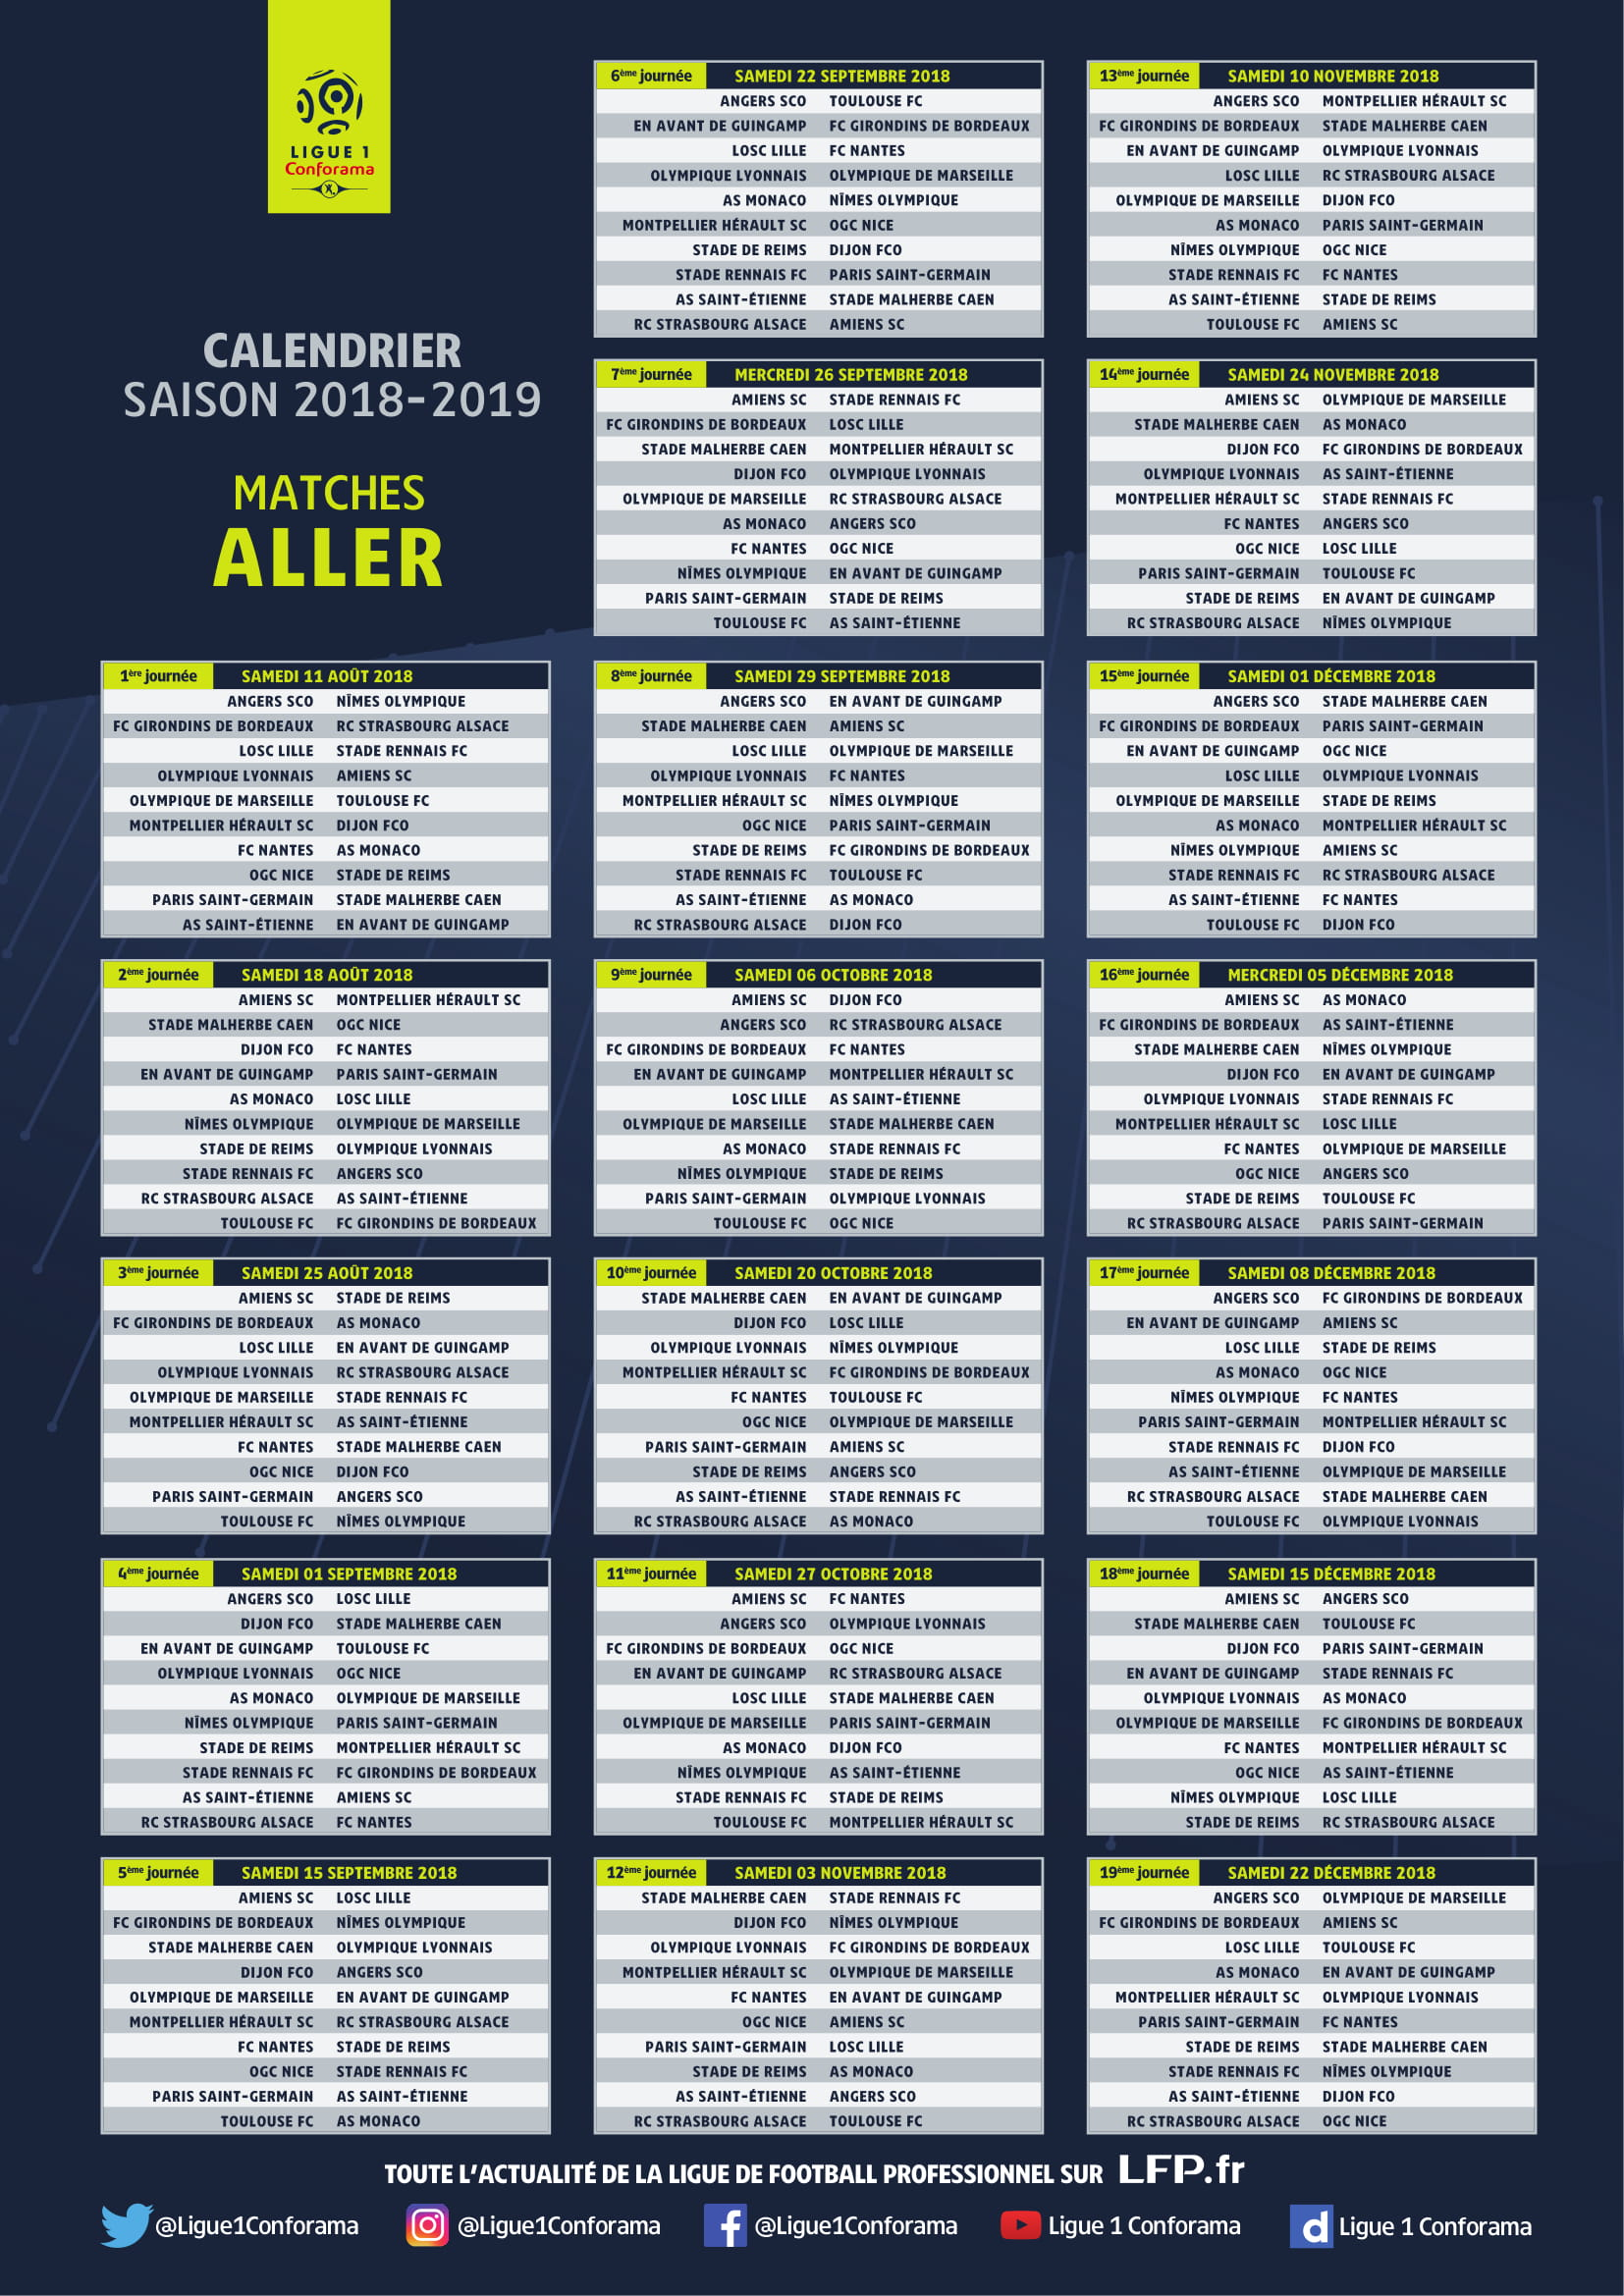 programme tv Ligue 1 calendrier match direct retransmission